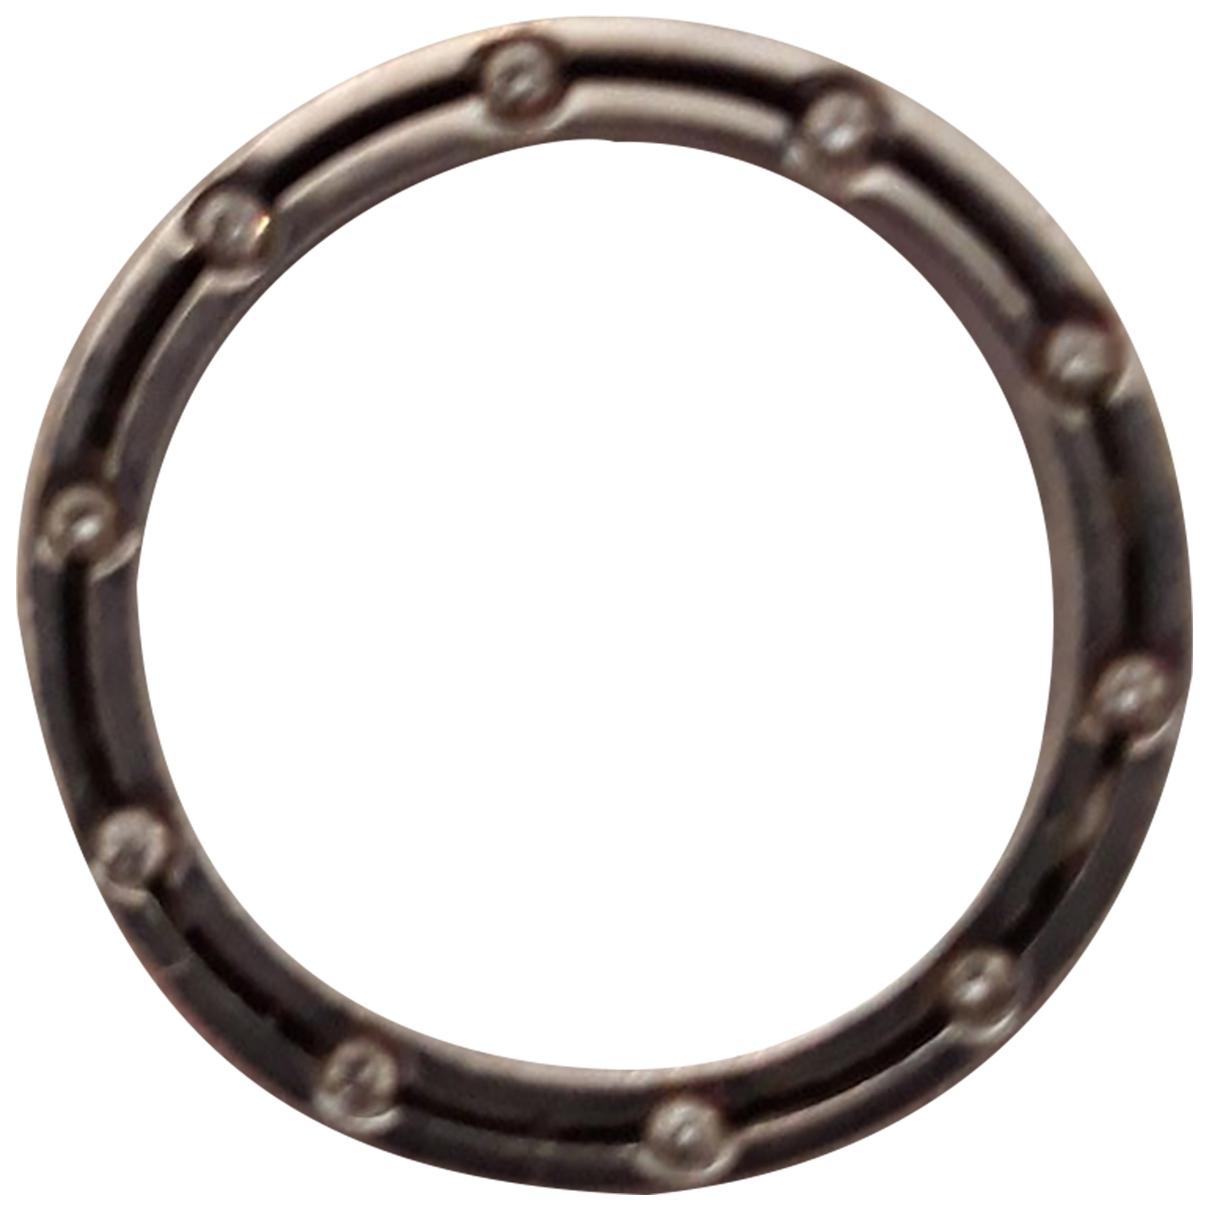 Damiani \N Silver White gold ring for Women \N